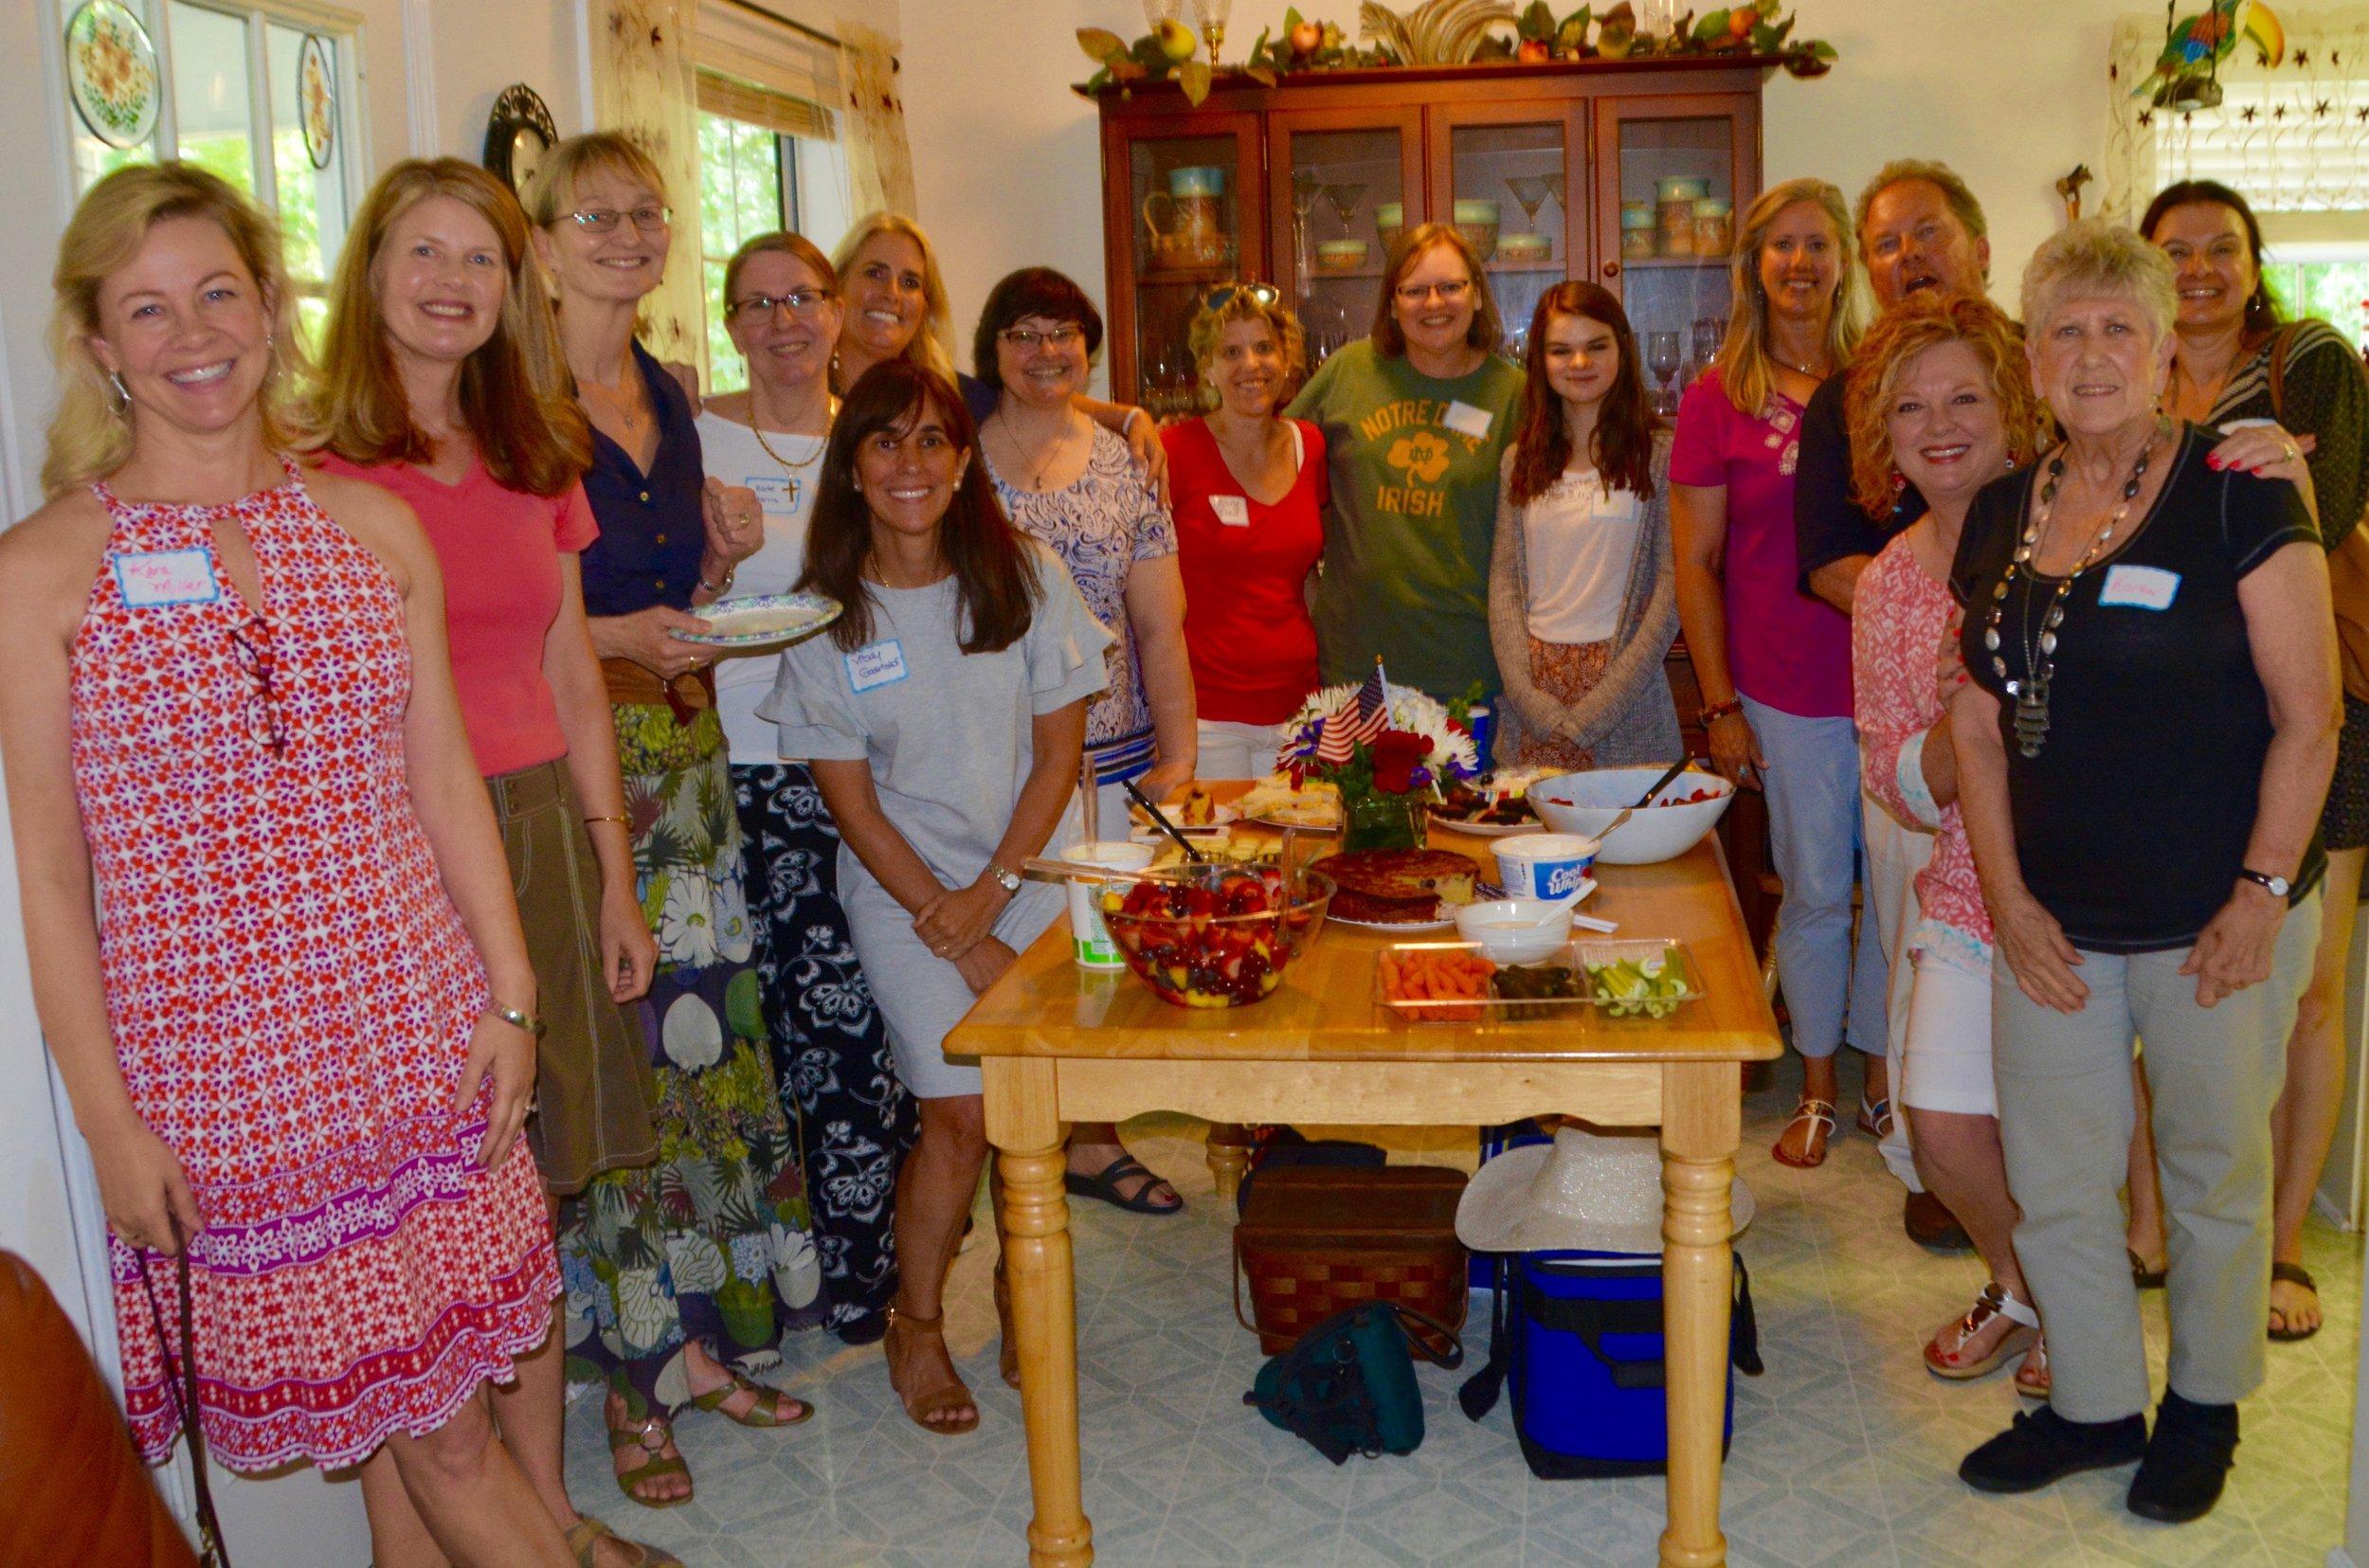 Joy filled faces of Marist friends